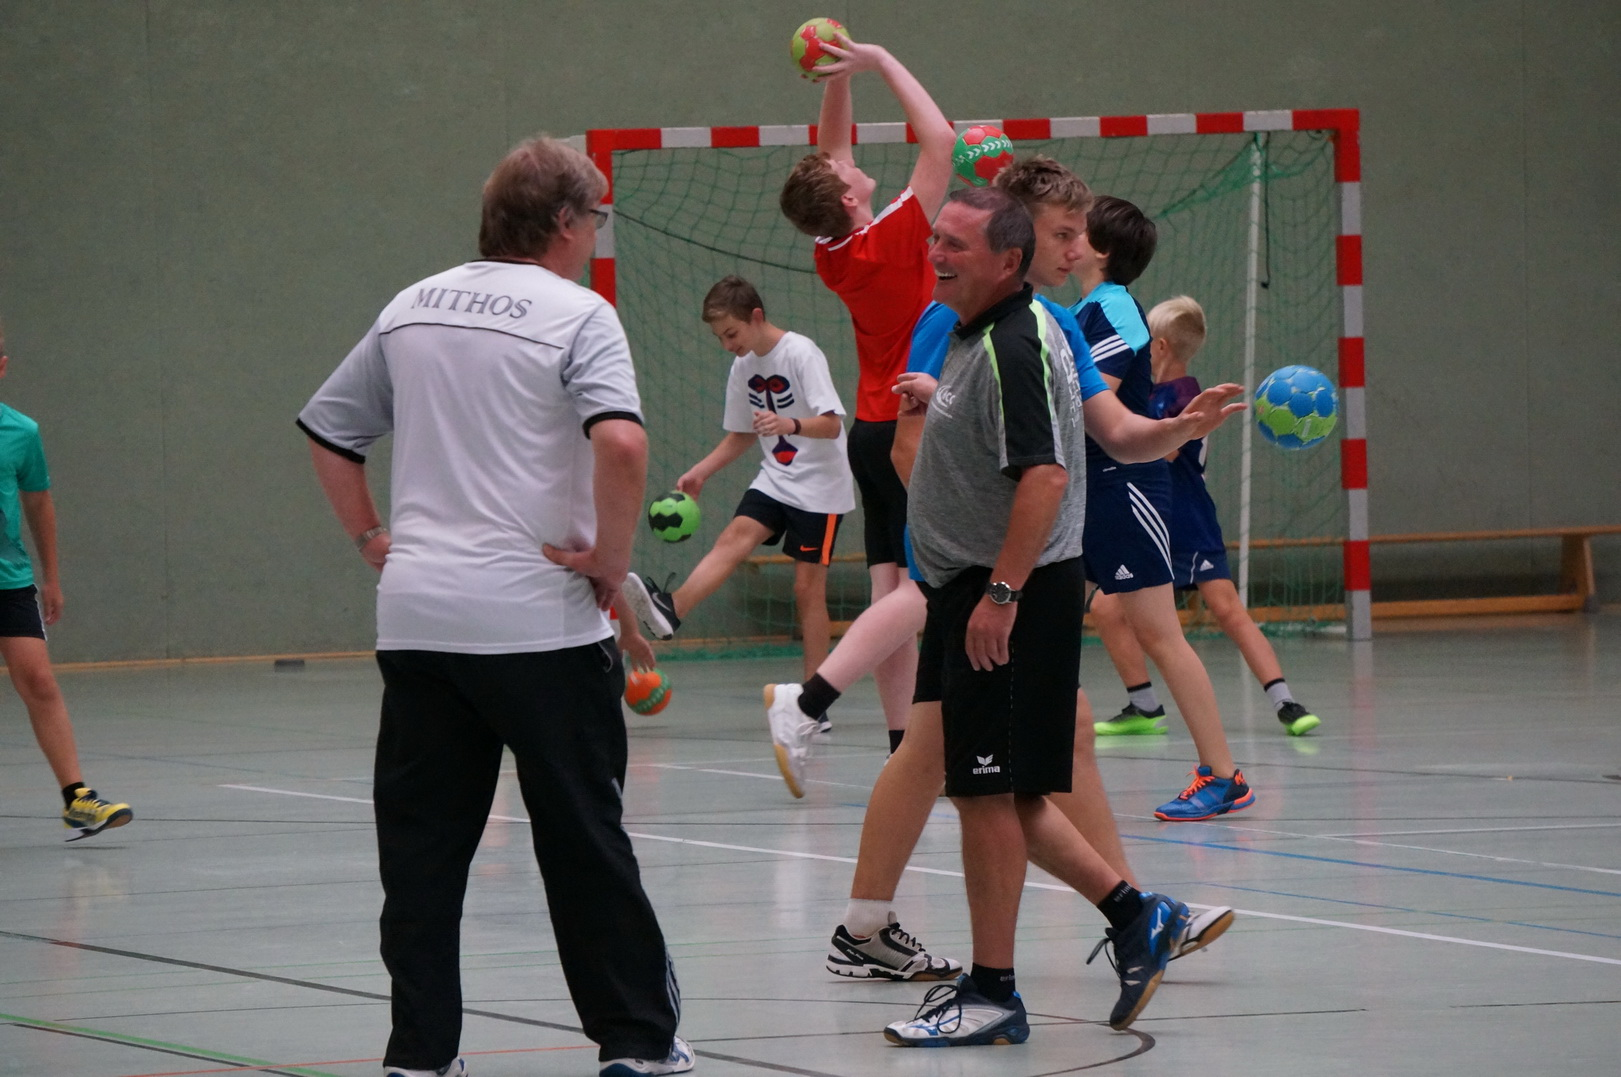 201808_Handballcamp_SDH_MG_030w